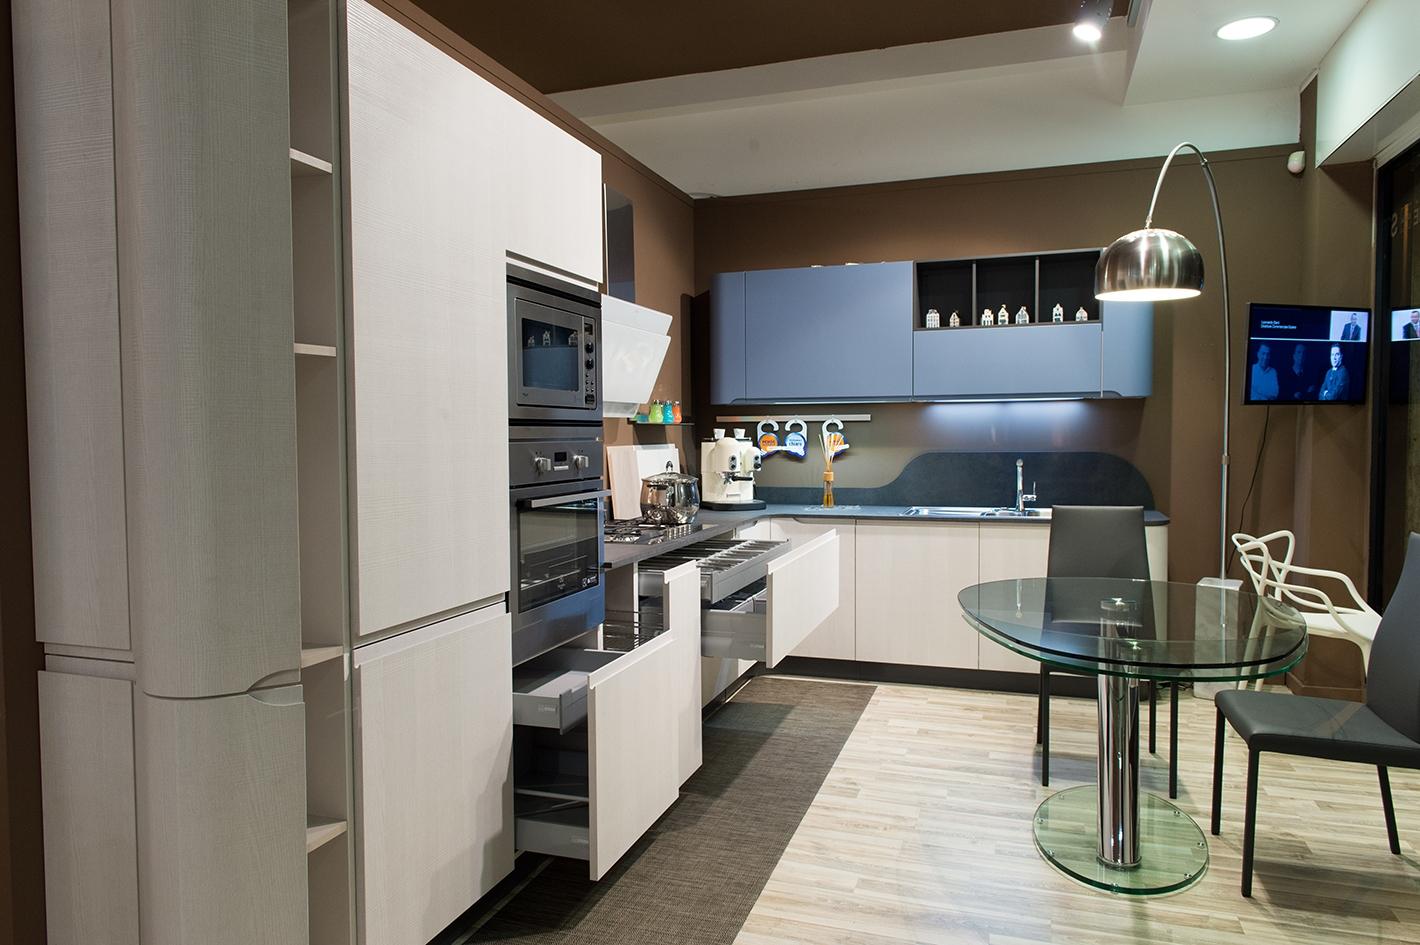 Cucina stosa bring elegant cucina stosa bring with cucina for Stosa cucina